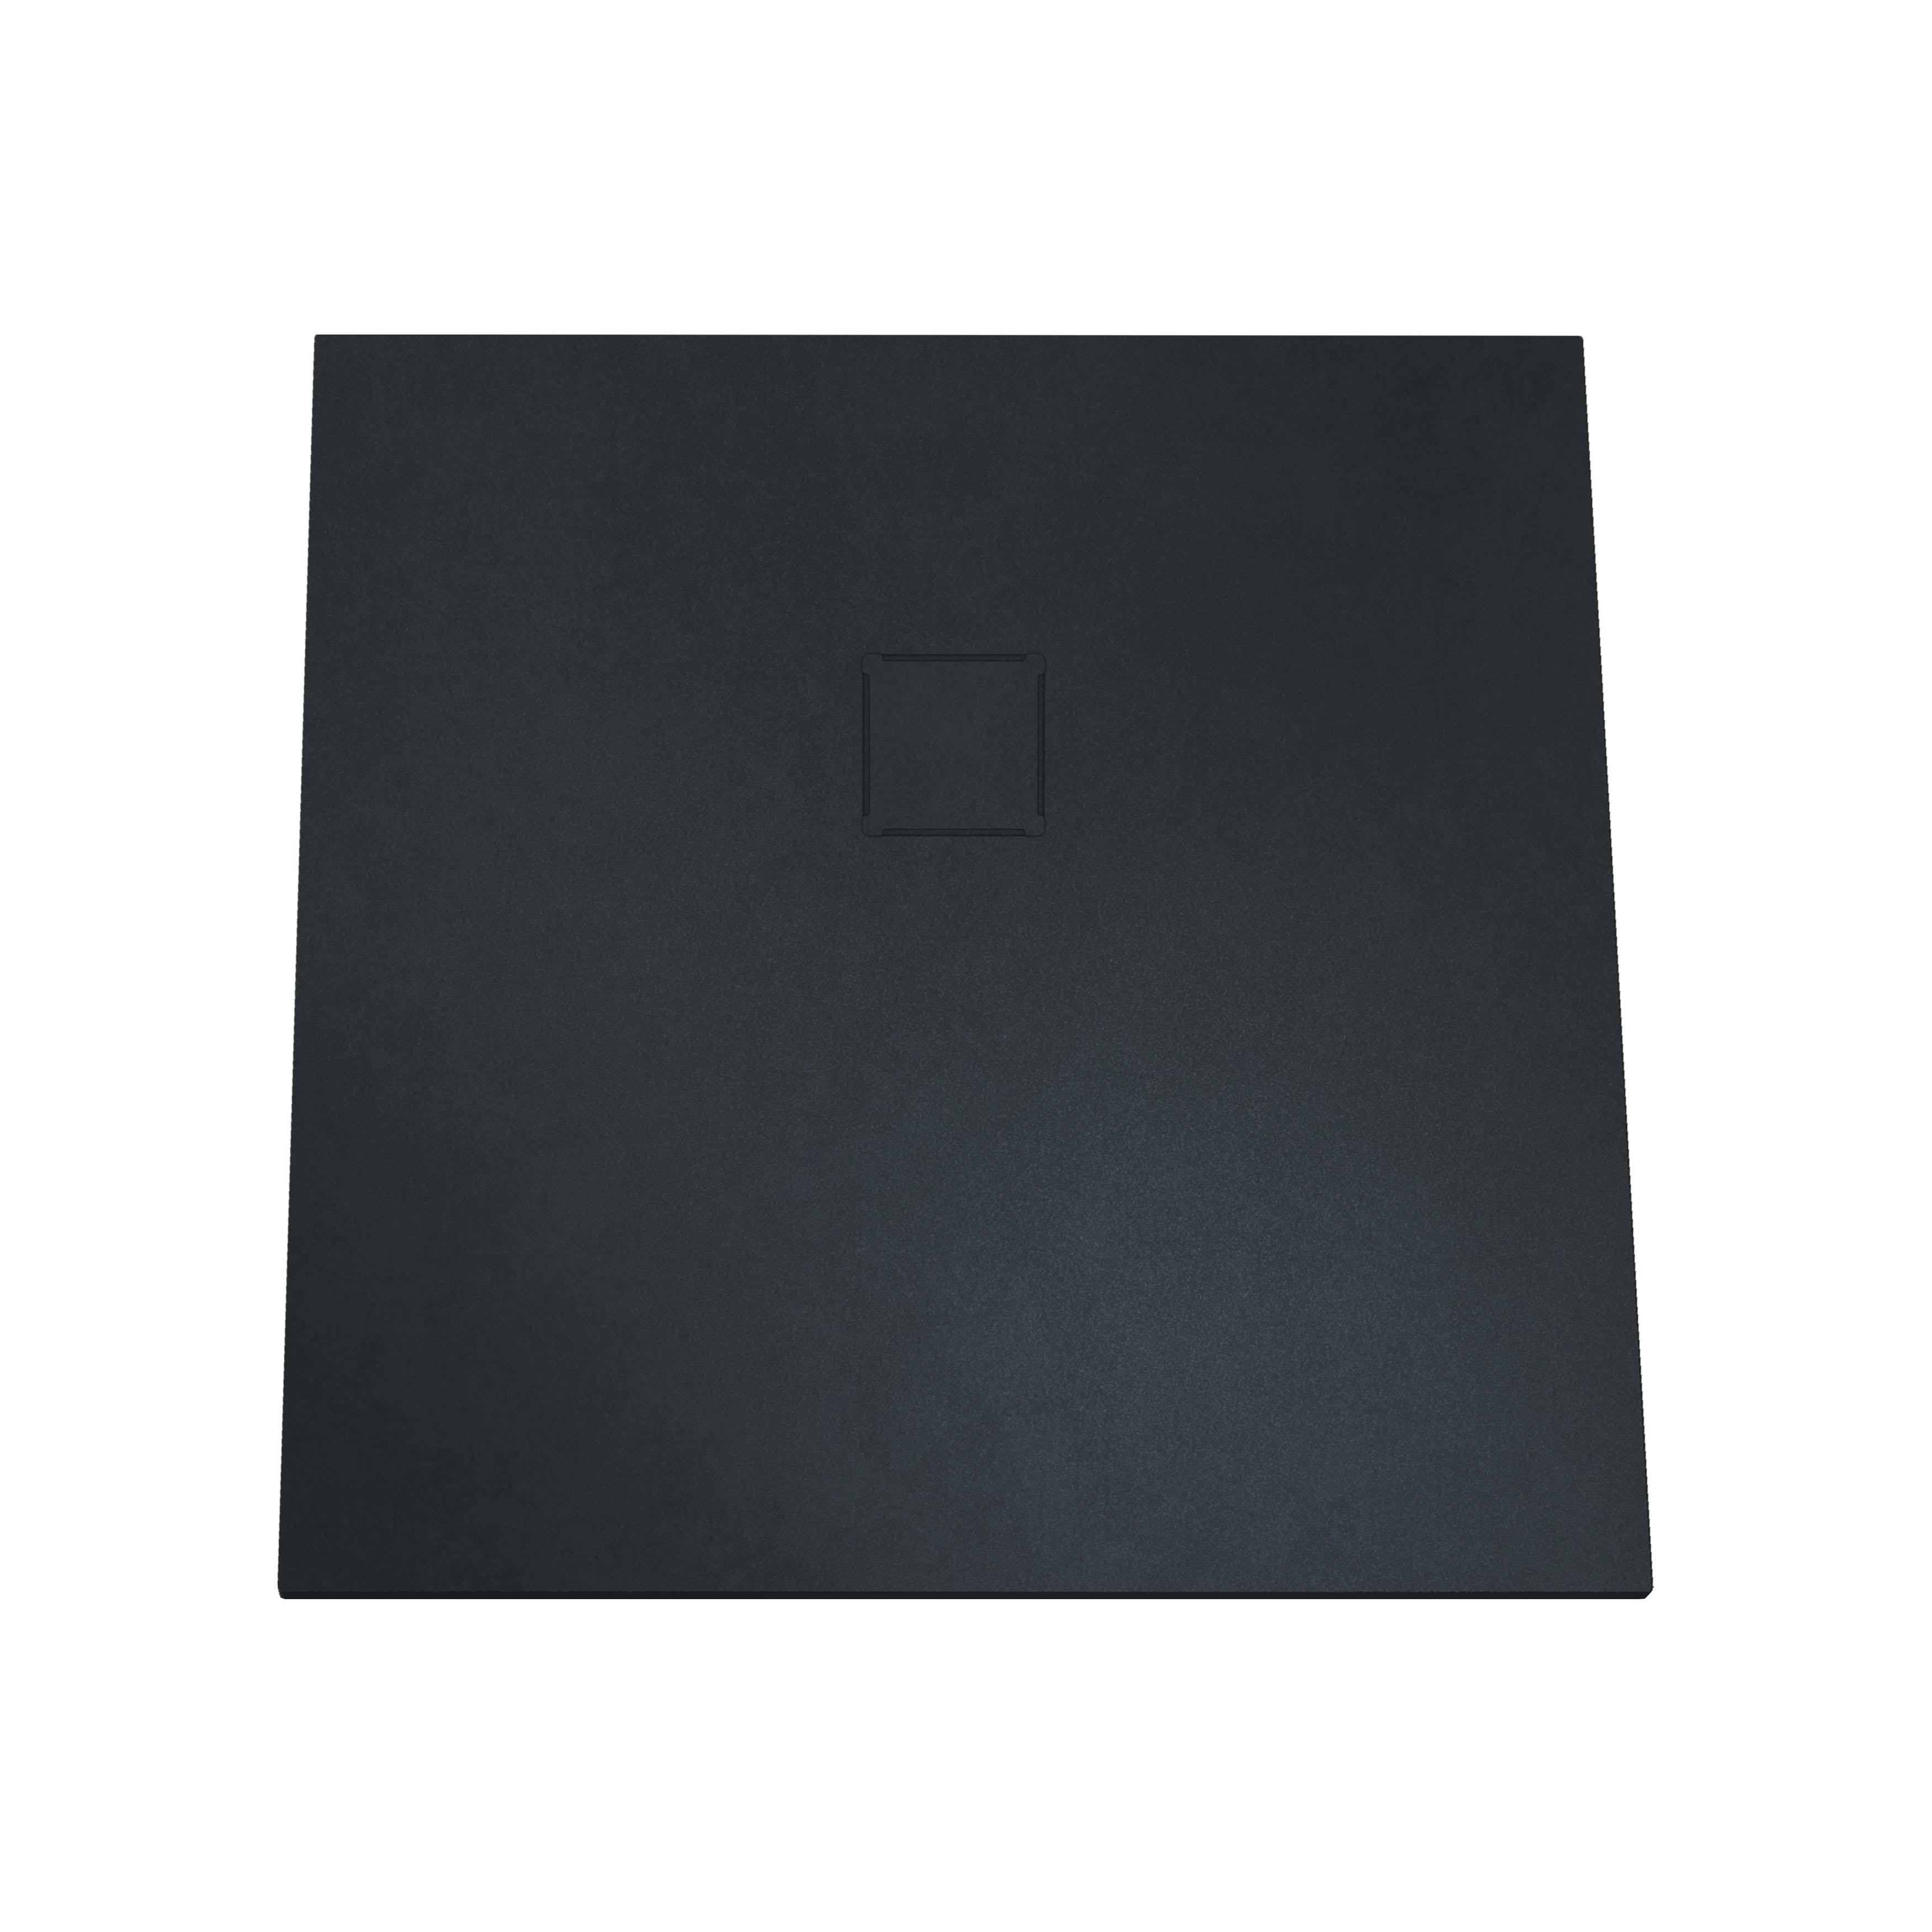 V-stone, receveur ultra plat en solid stone, 100 cm, anthraciteacite